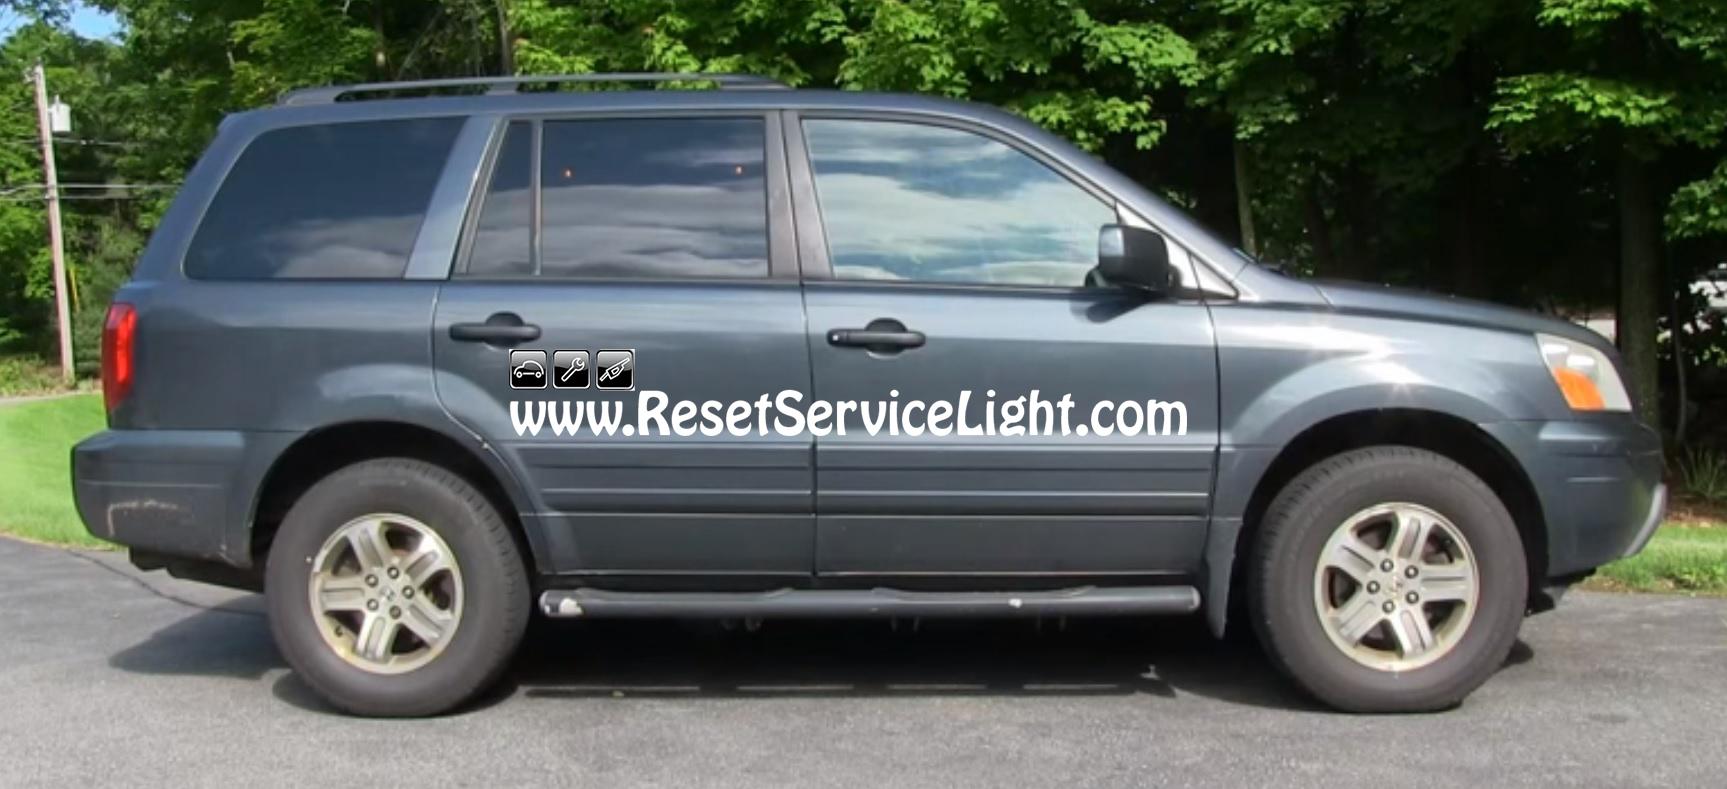 Diy Remove The Rear Door Panel On Honda Pilot 2003 To